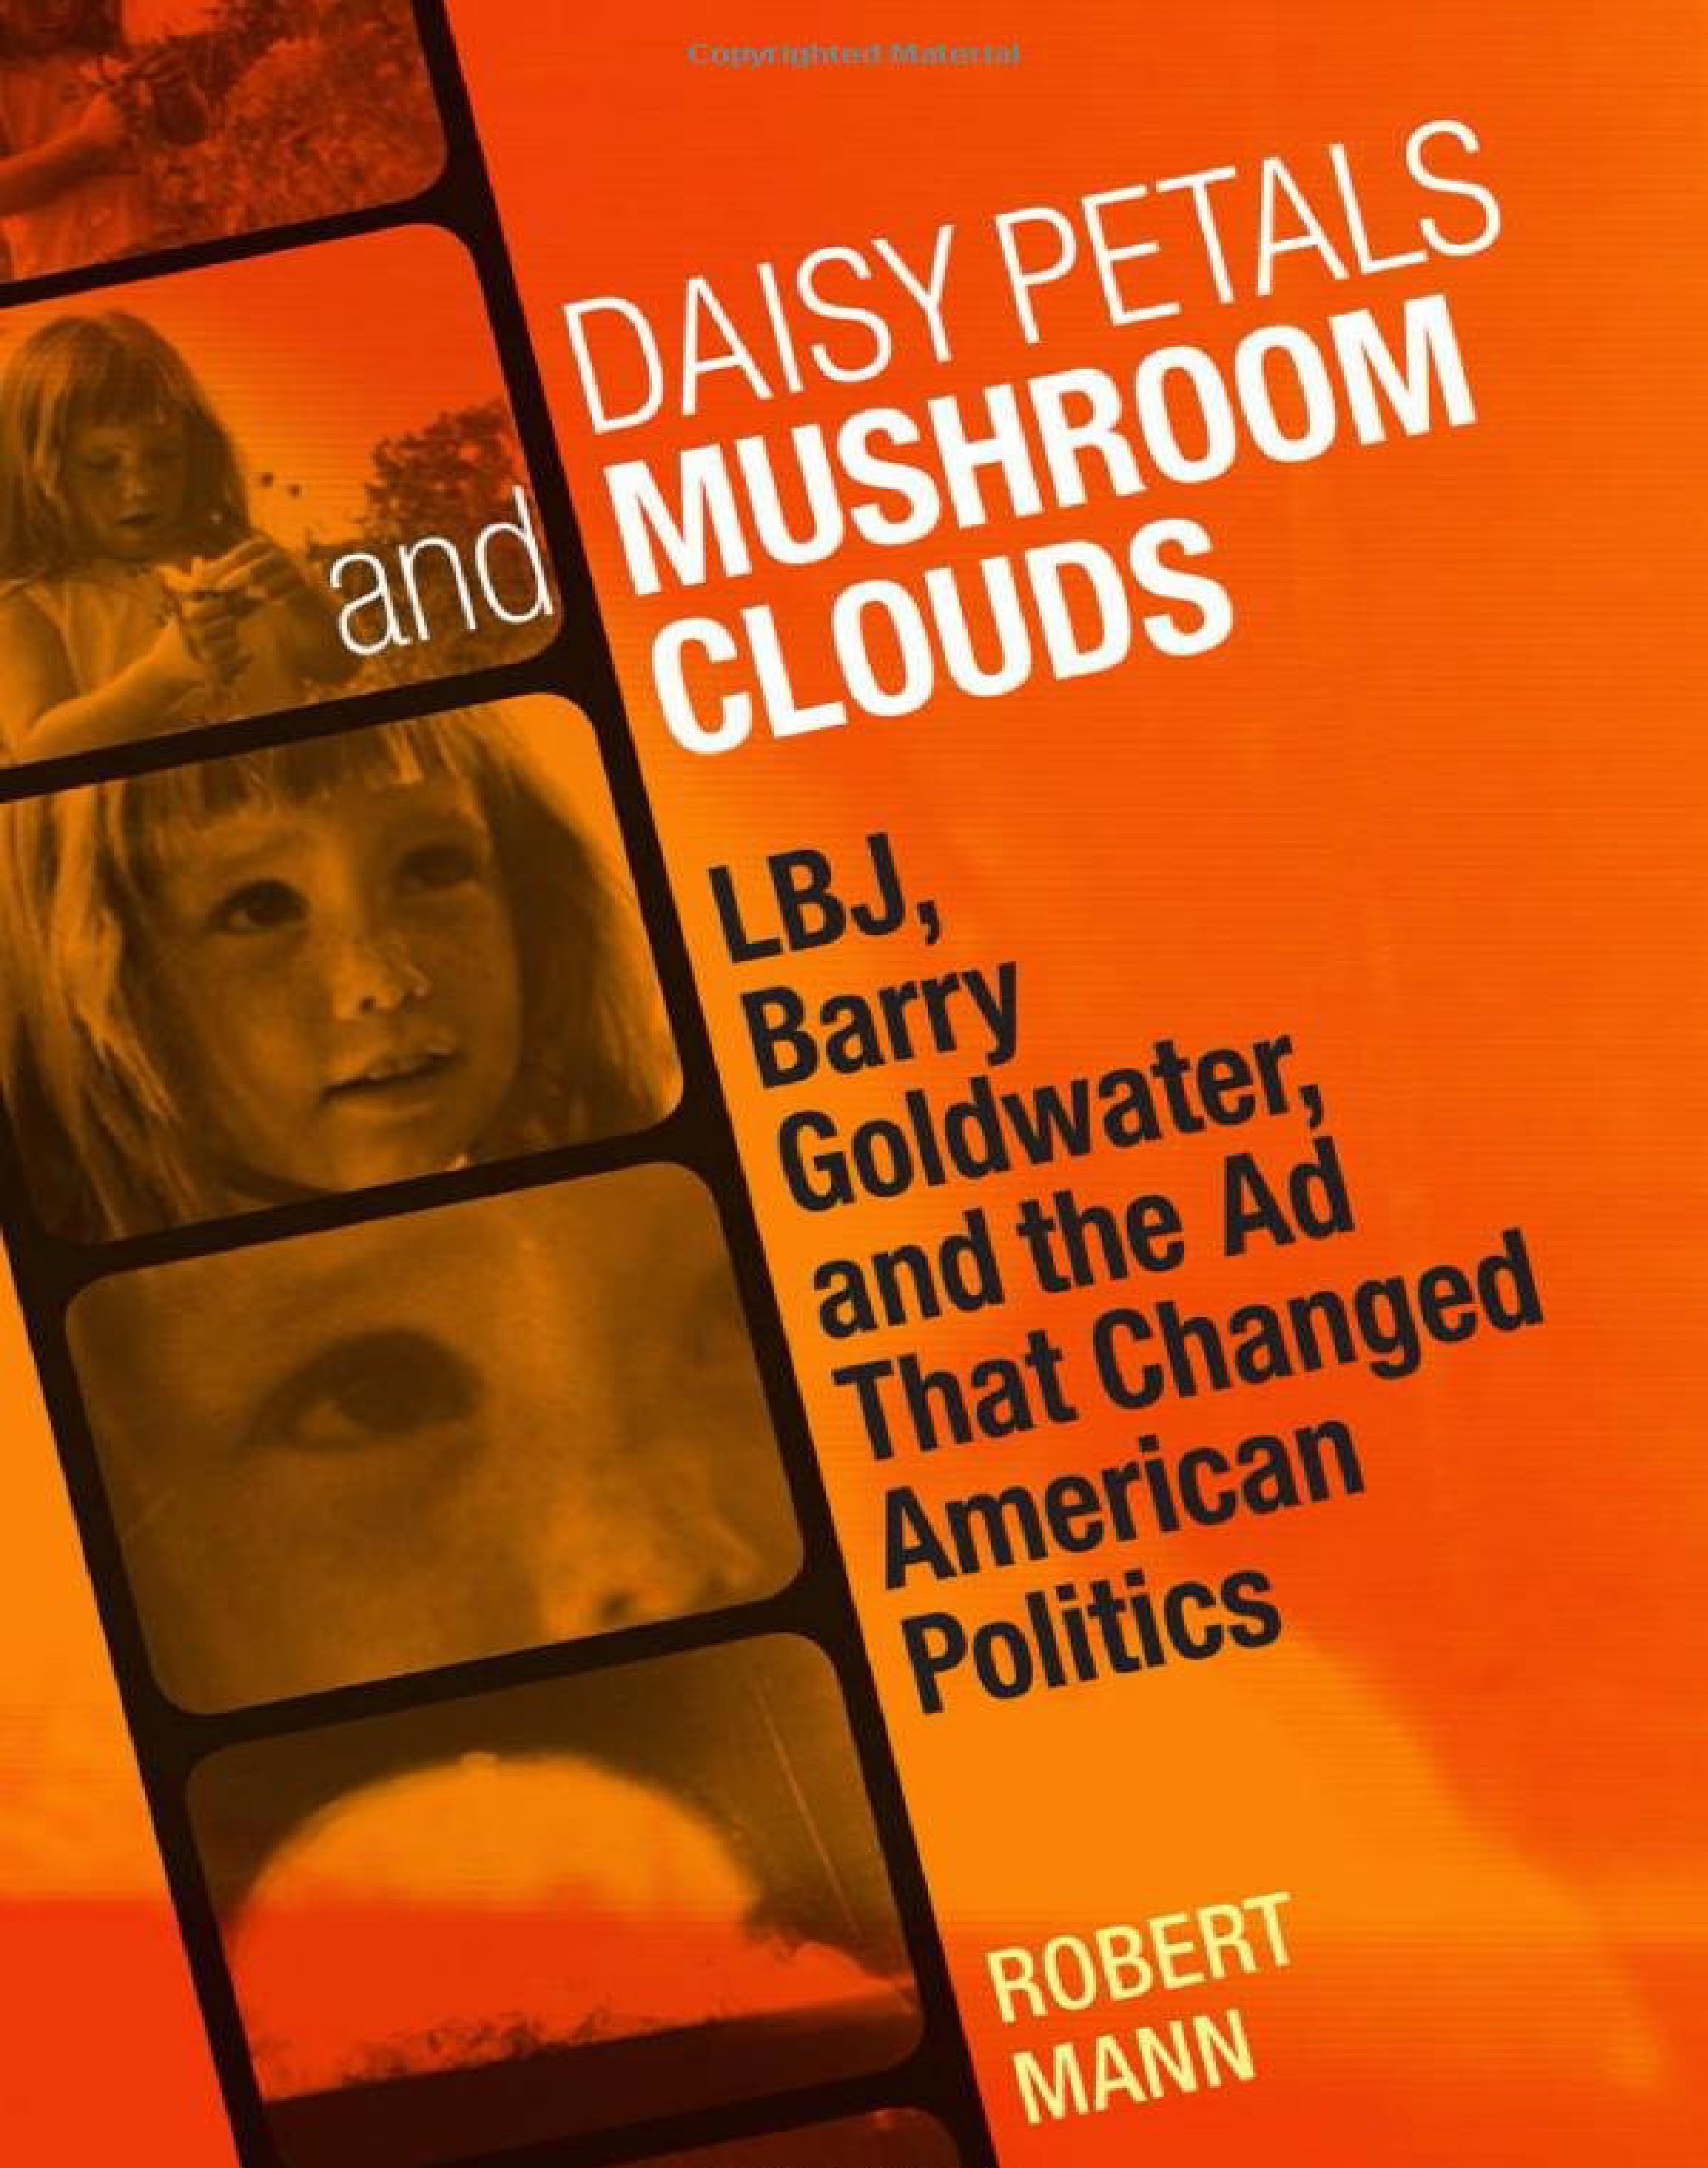 daisy-petals-and-mushroom-clouds-01